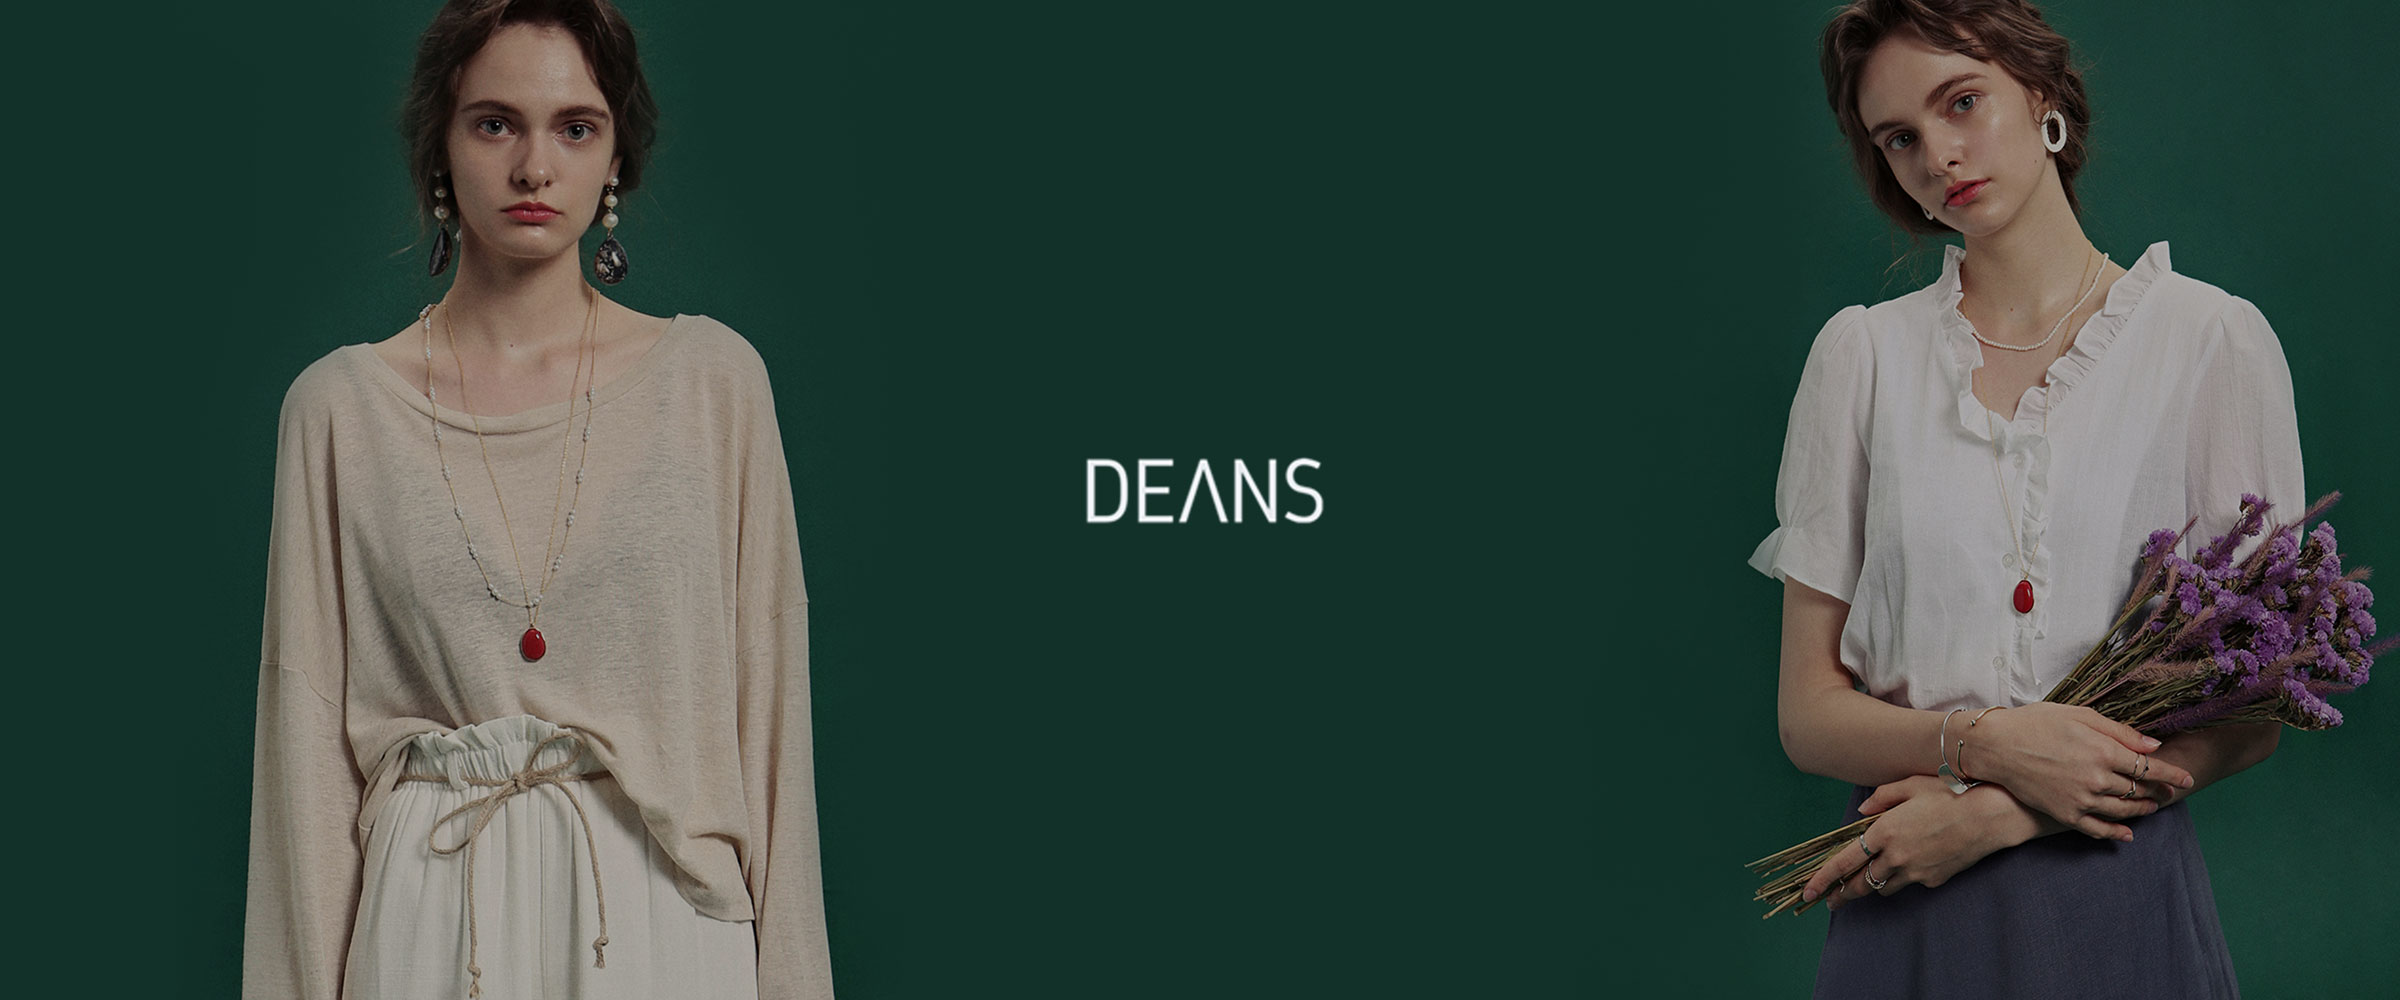 deans.jpg